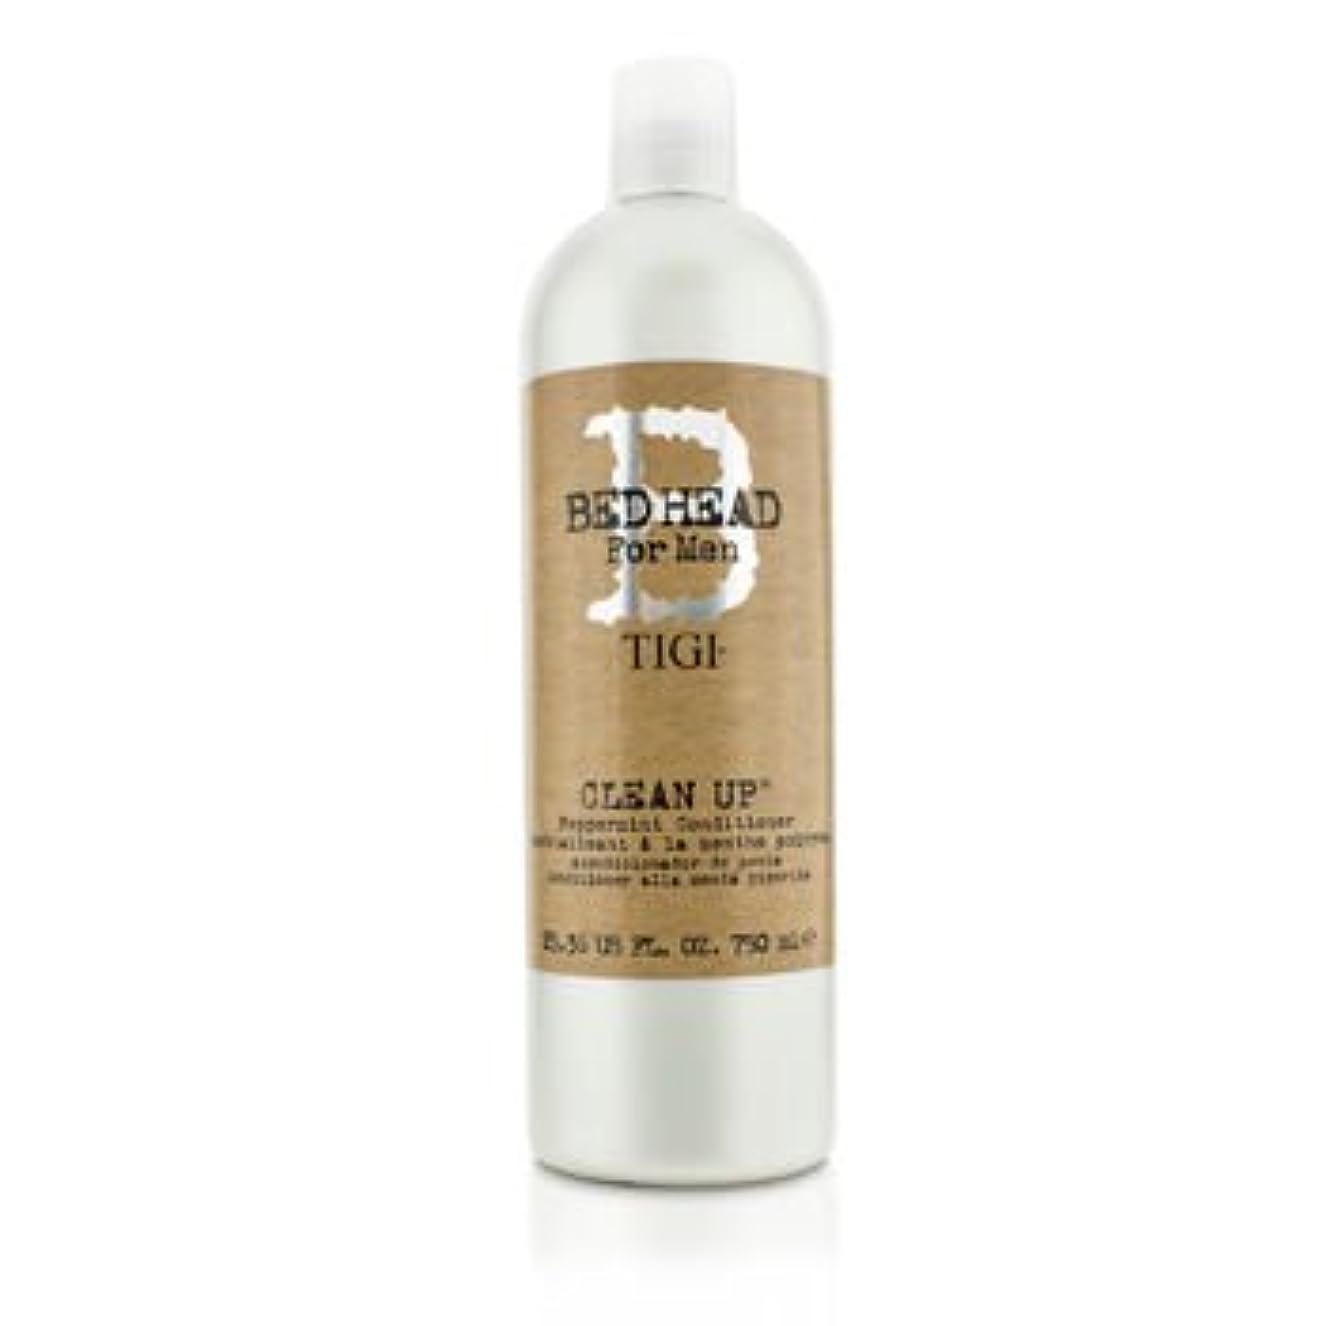 [Tigi] Bed Head B For Men Clean Up Peppermint Conditioner 750ml/25.36oz